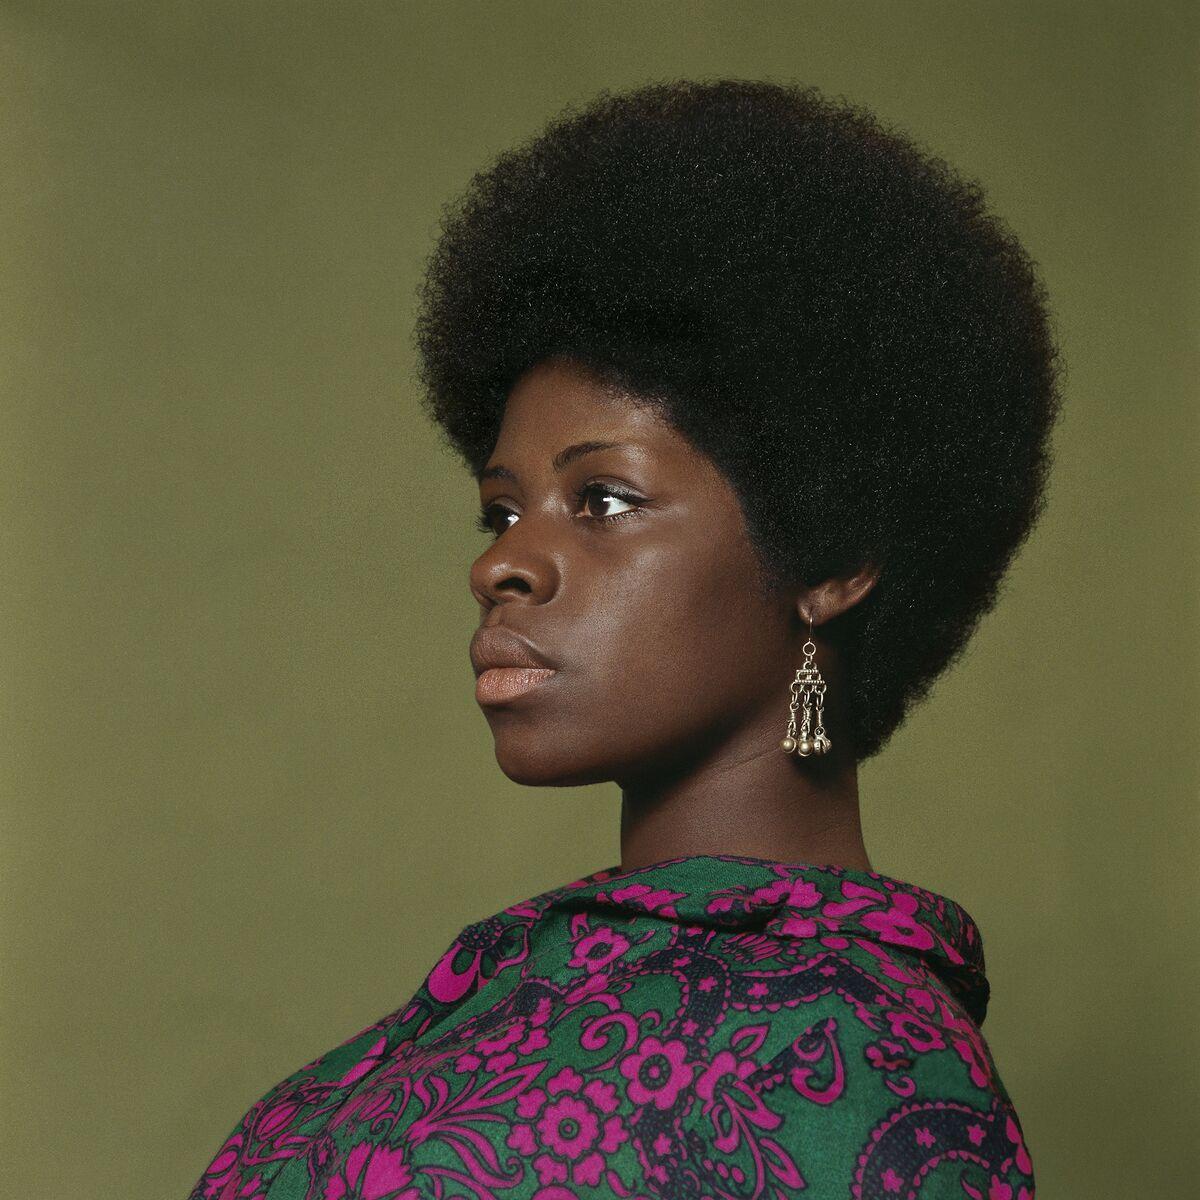 Kwame Brathwaite, Sikolo Brathwaite, African Jazz-Art Society & Studios (AJASS), Harlem, ca. 1968, from Kwame Brathwaite: Black Is Beautiful, Aperture, 2019. © Kwame Brathwaite.